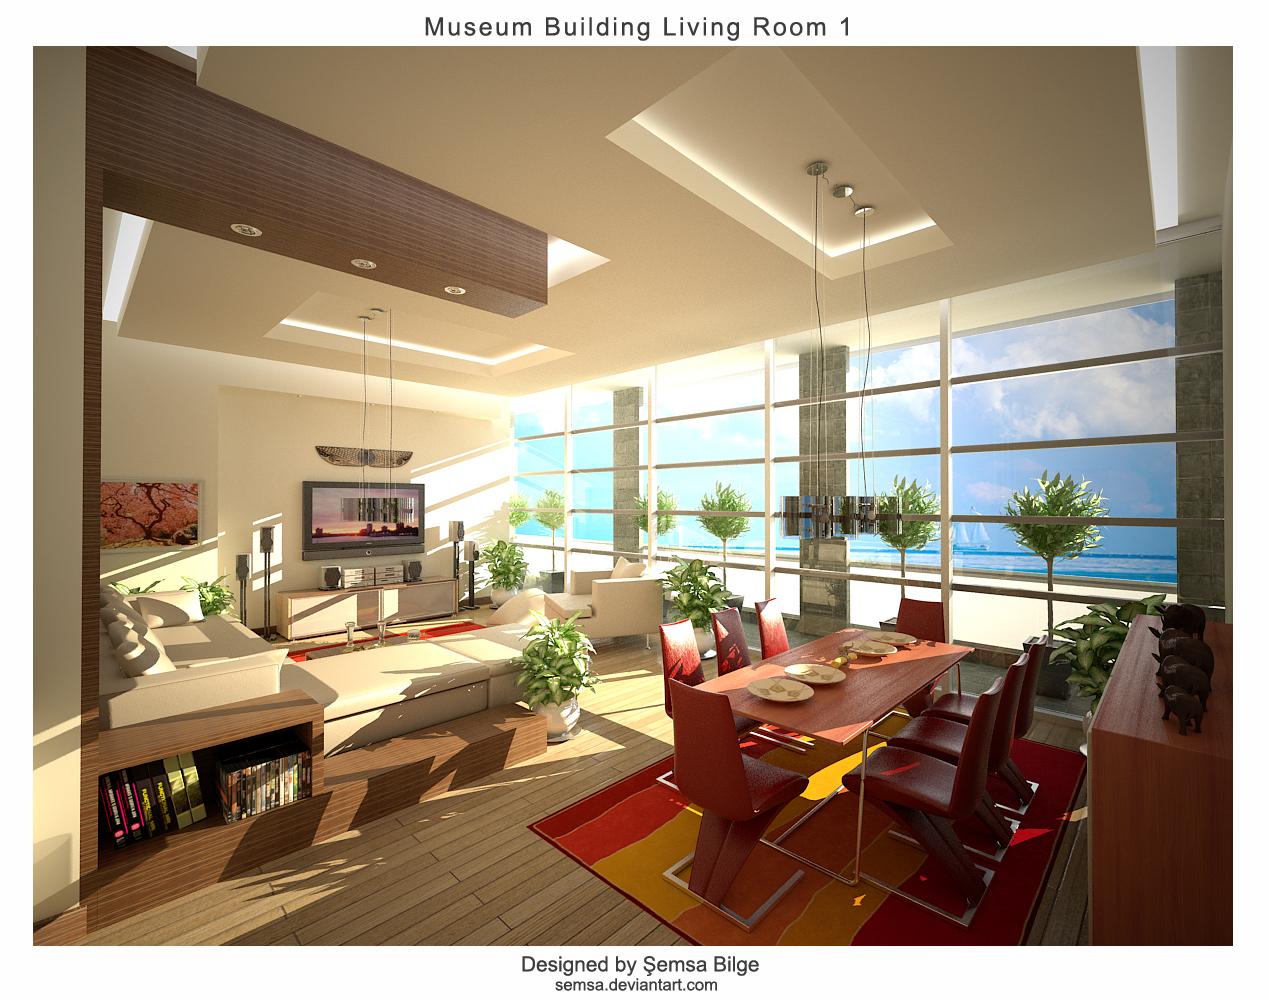 M.Build.Living Room 1 by Semsa